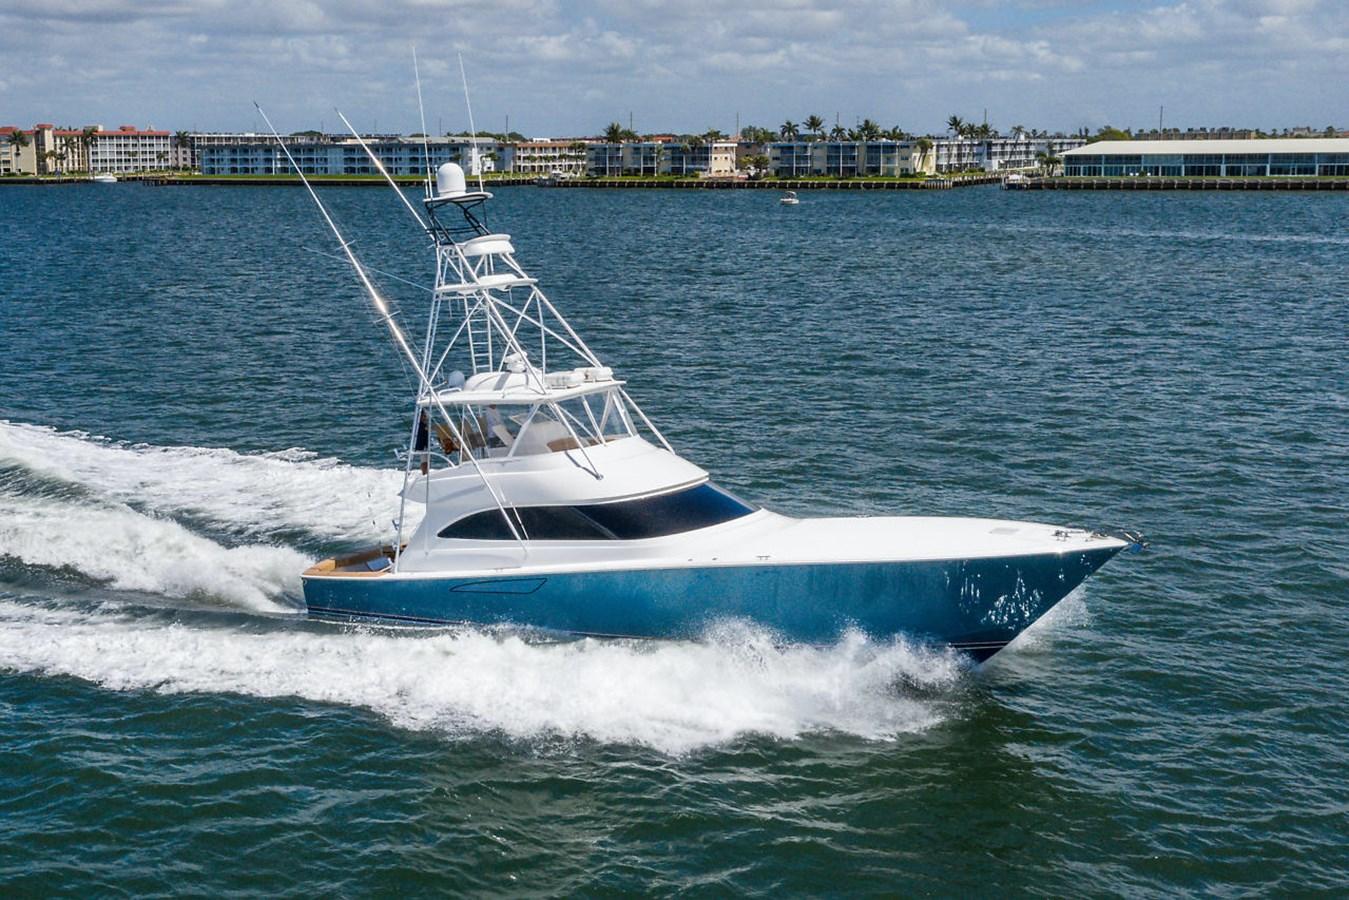 006-648RiversideRd-NorthPalmBeach-FL-small 2014 VIKING Convertible Sport Fisherman 2895520